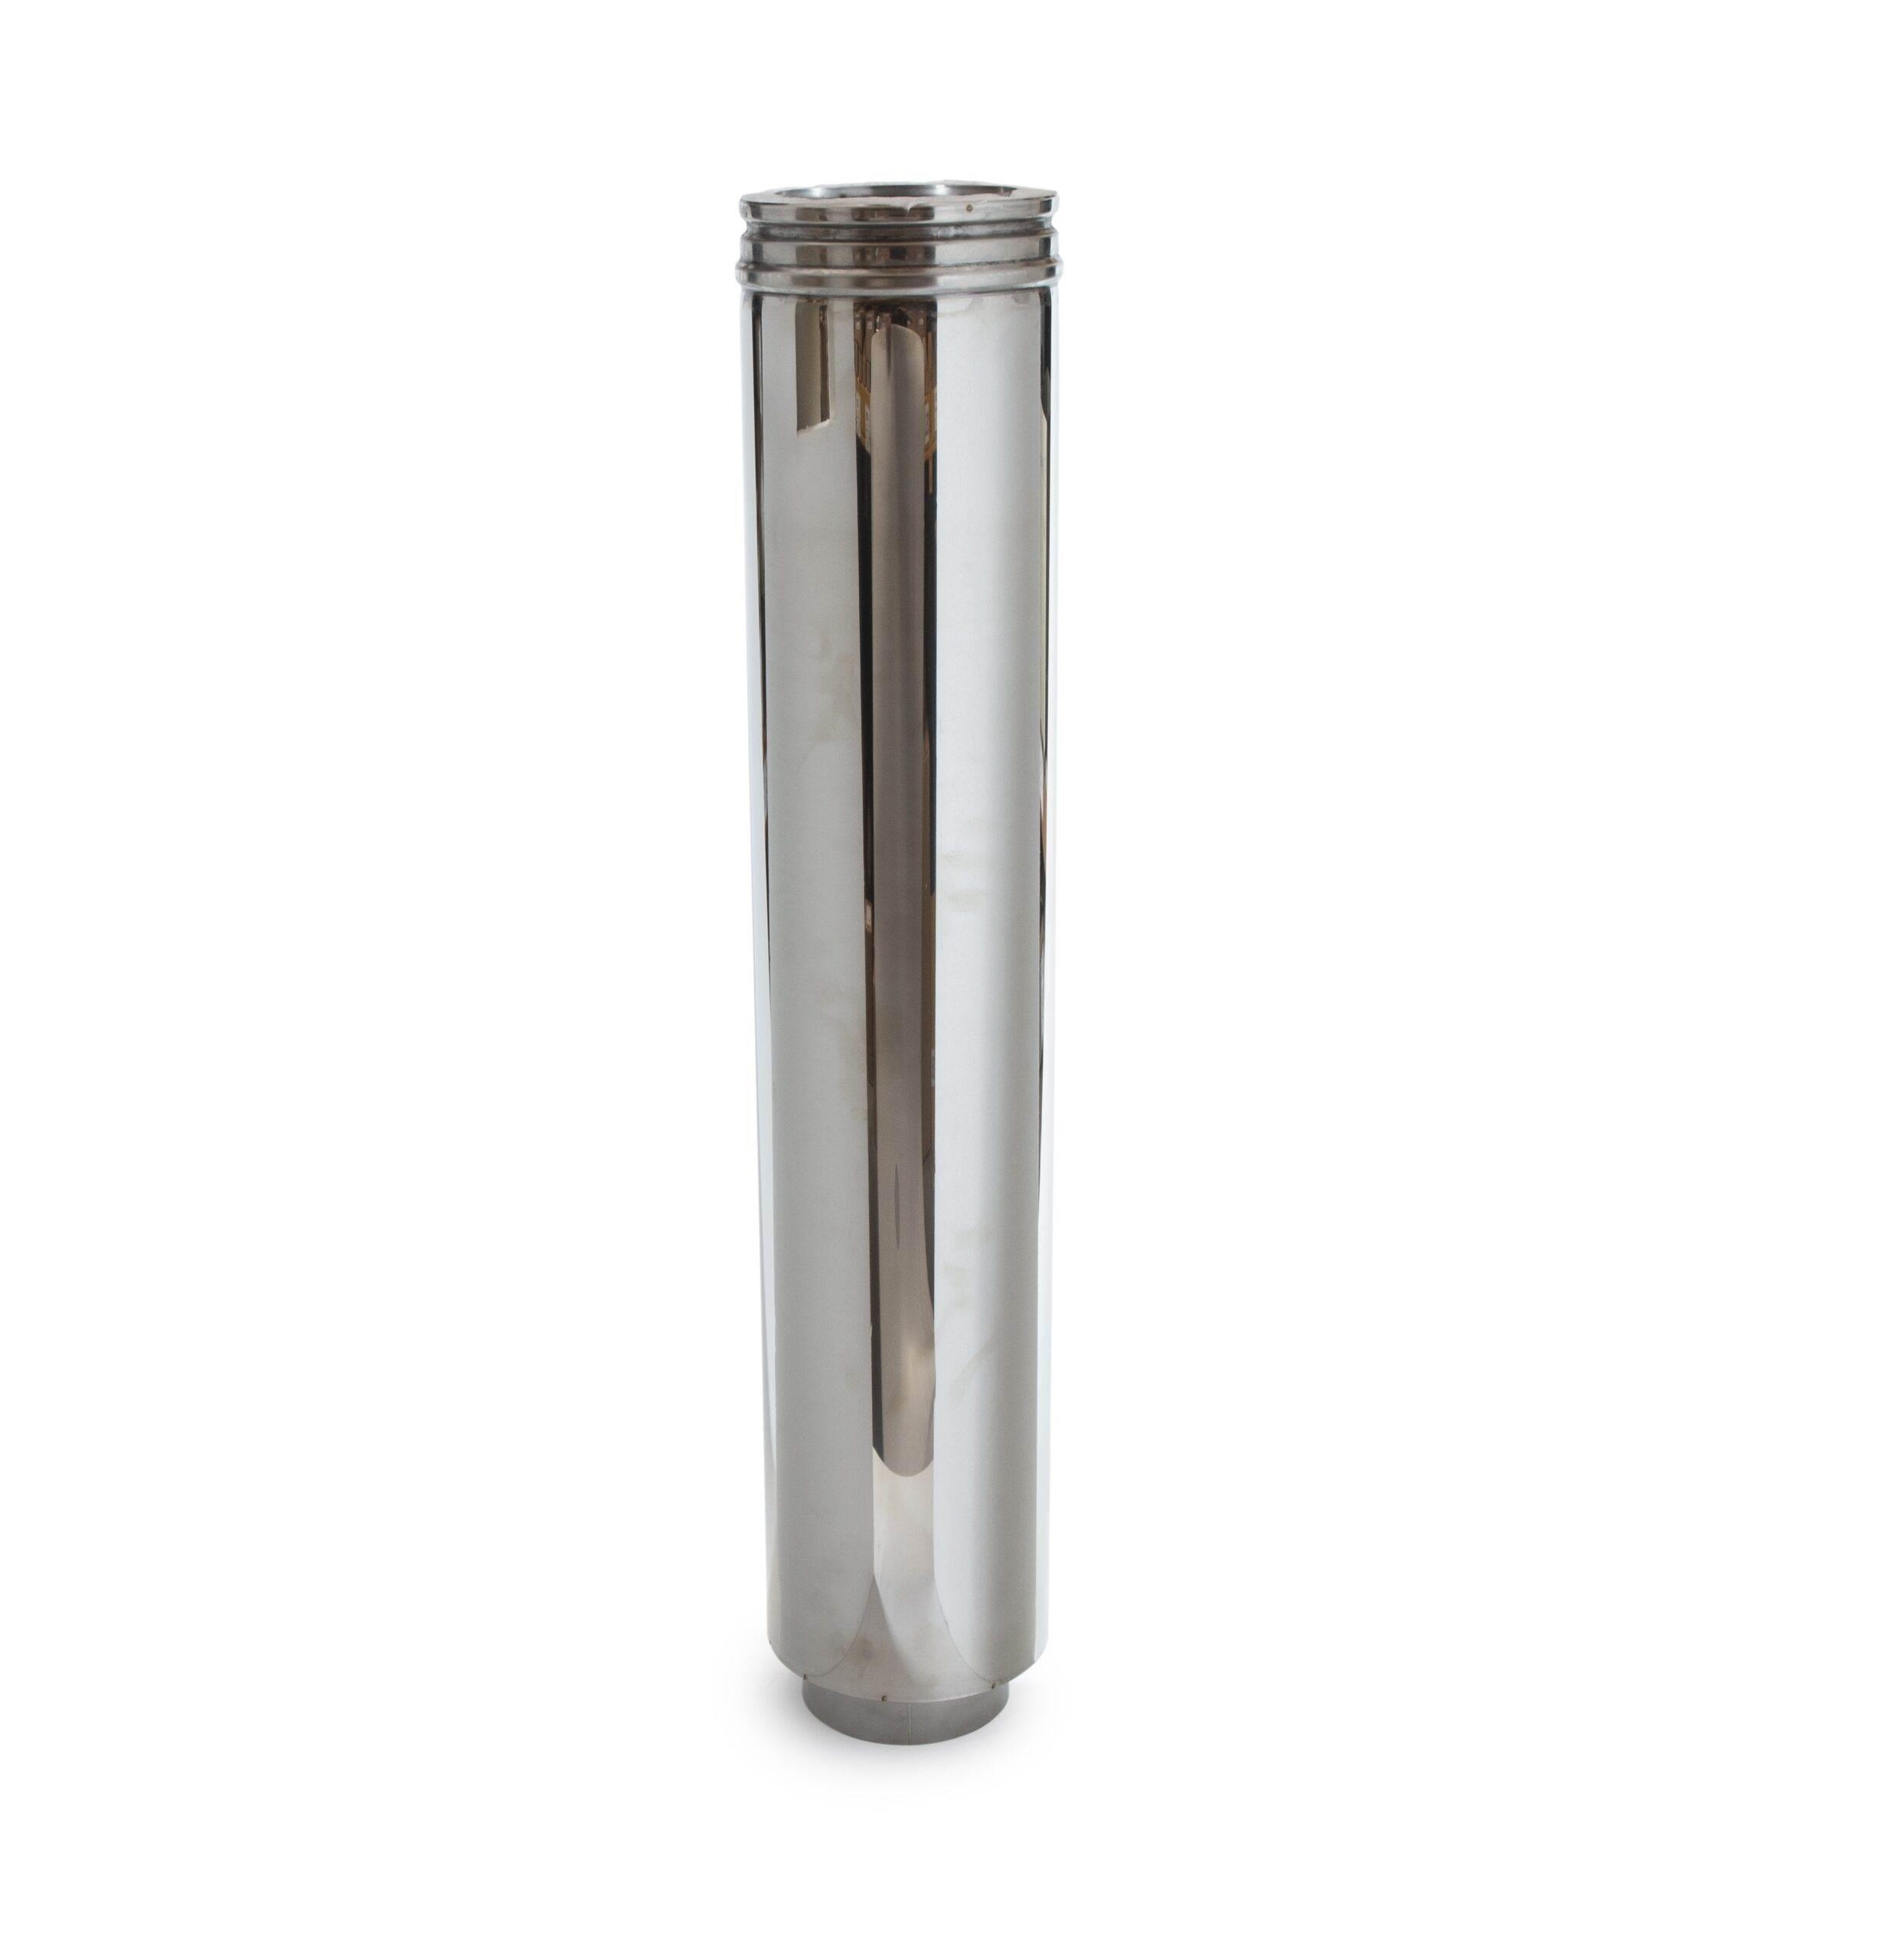 Insulated Chimney System J2175 Starter Flue Pipe